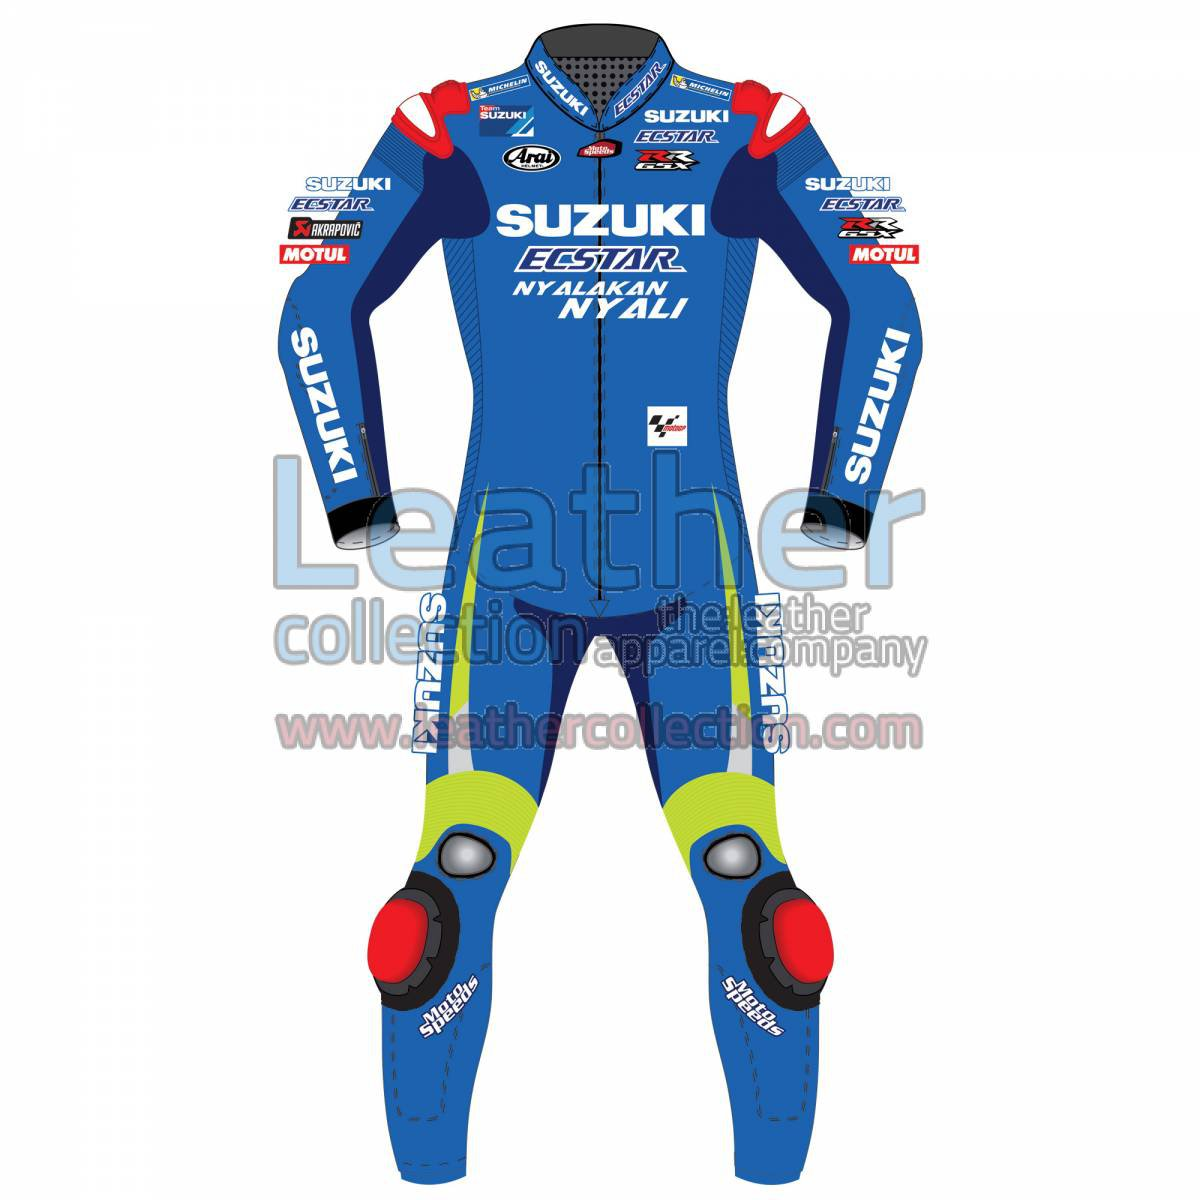 Maverick Vinales Suzuki MotoGP 2016 Race Suit